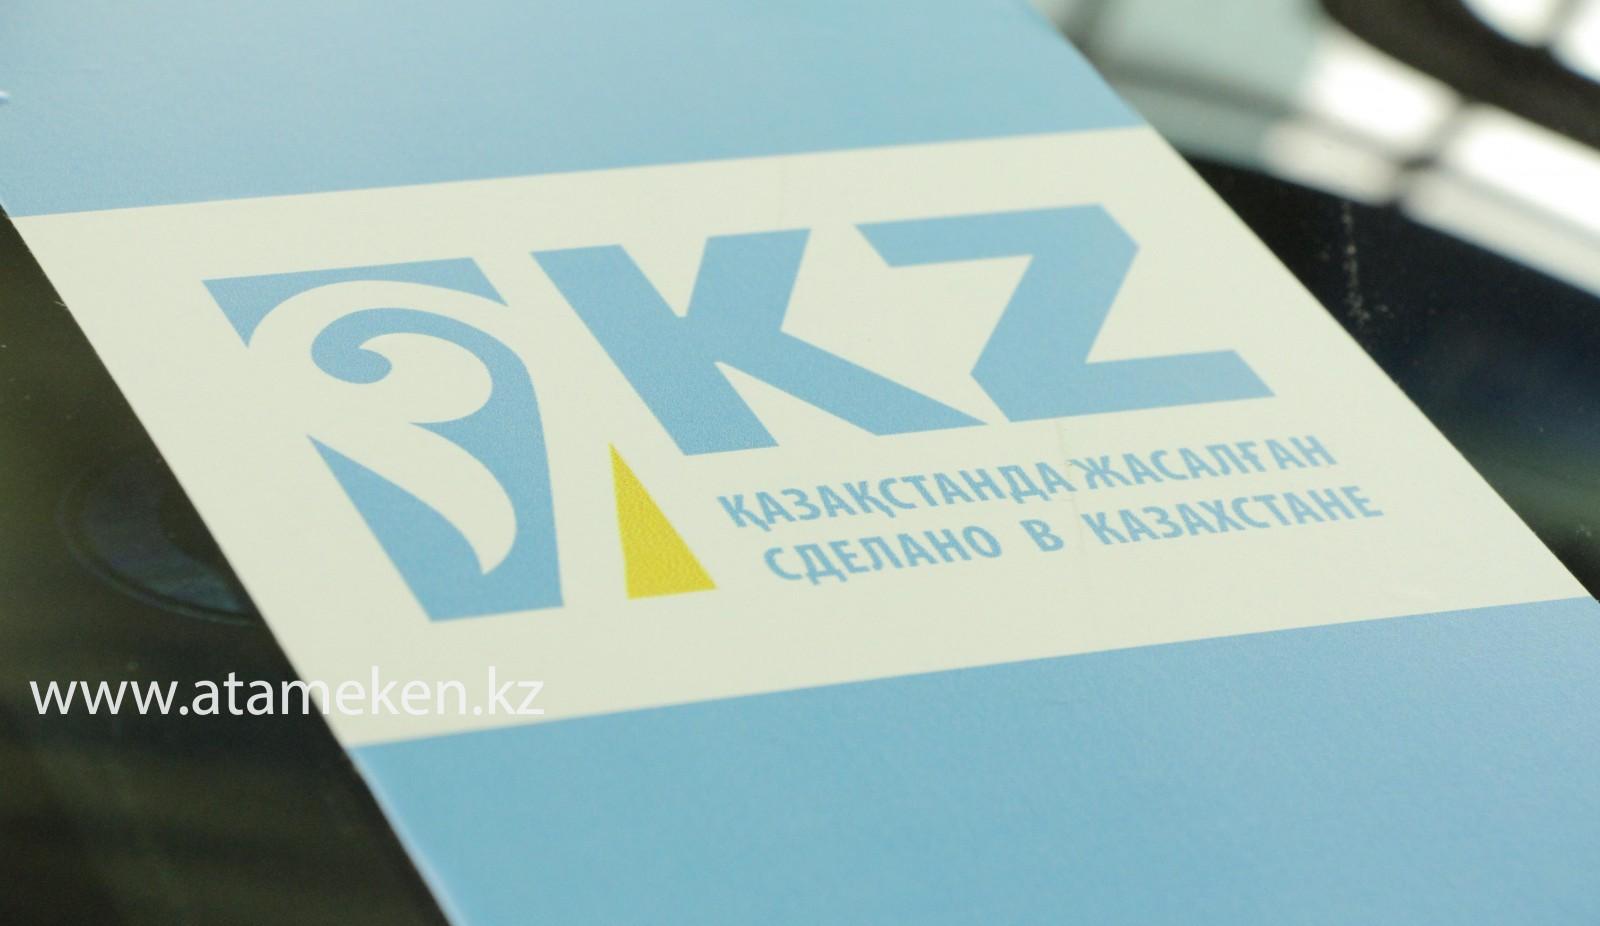 В Астрахани начала работу выставка «Сделано в Казахстане» , предприятие, Астрахань, Выставка, Сделано в Казахстане